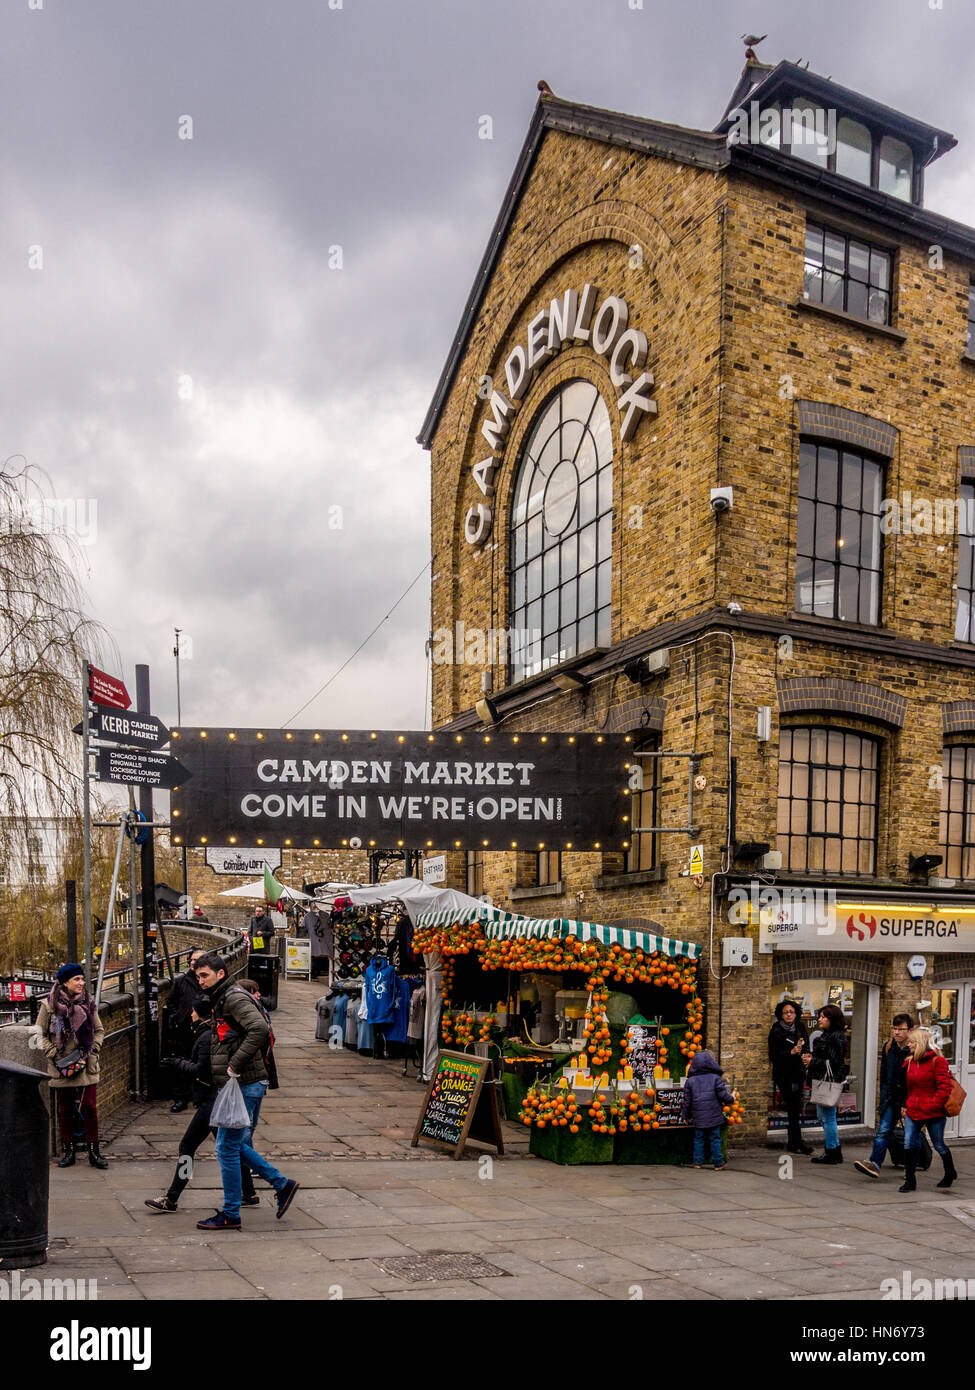 Camden Market. Come in we're open sign, Camden, London, UK. - Stock Image